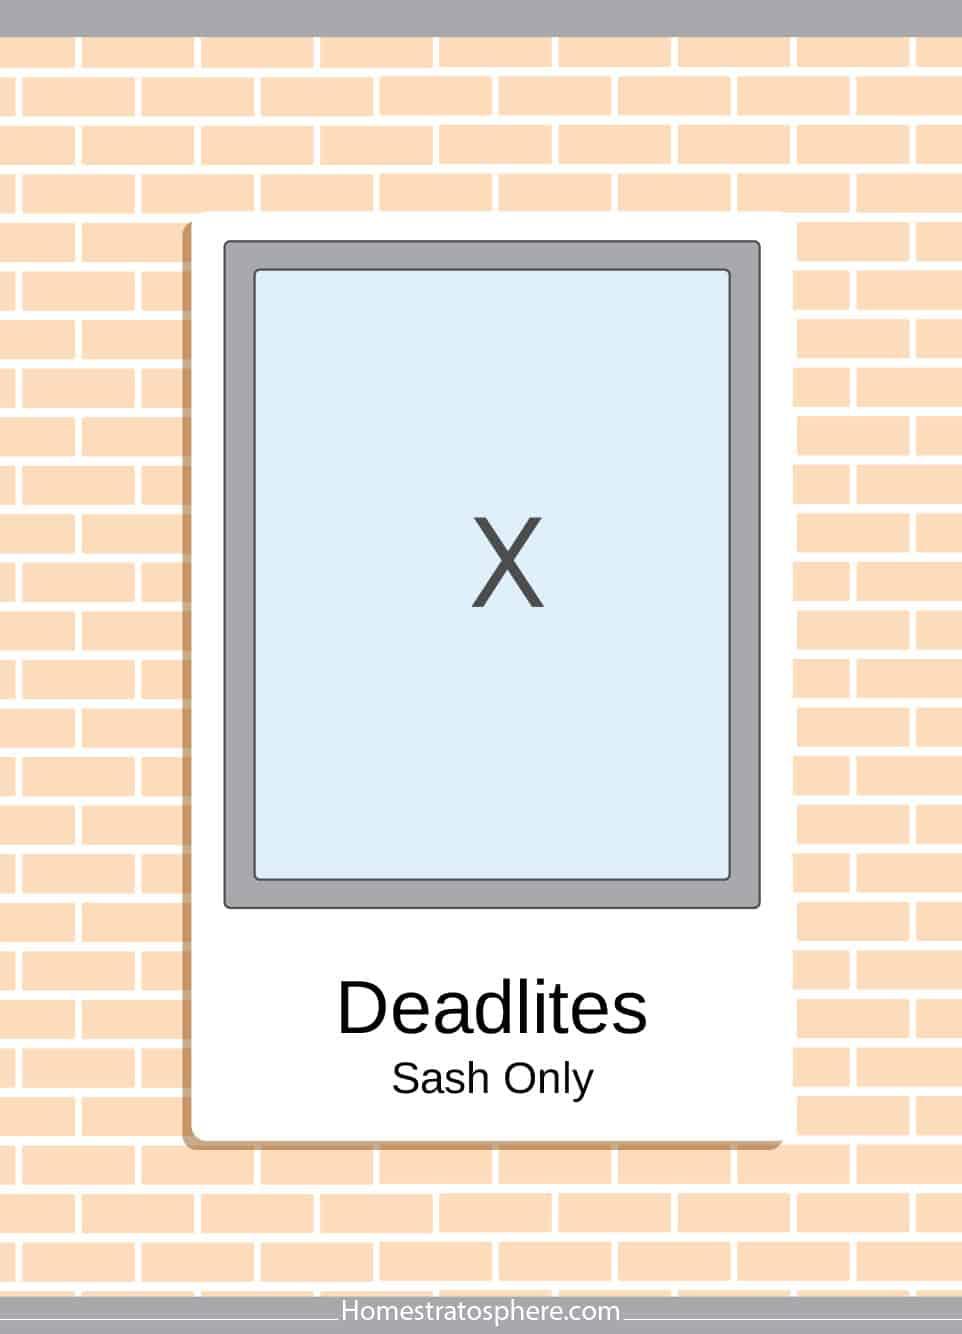 Deadlites sash only window design